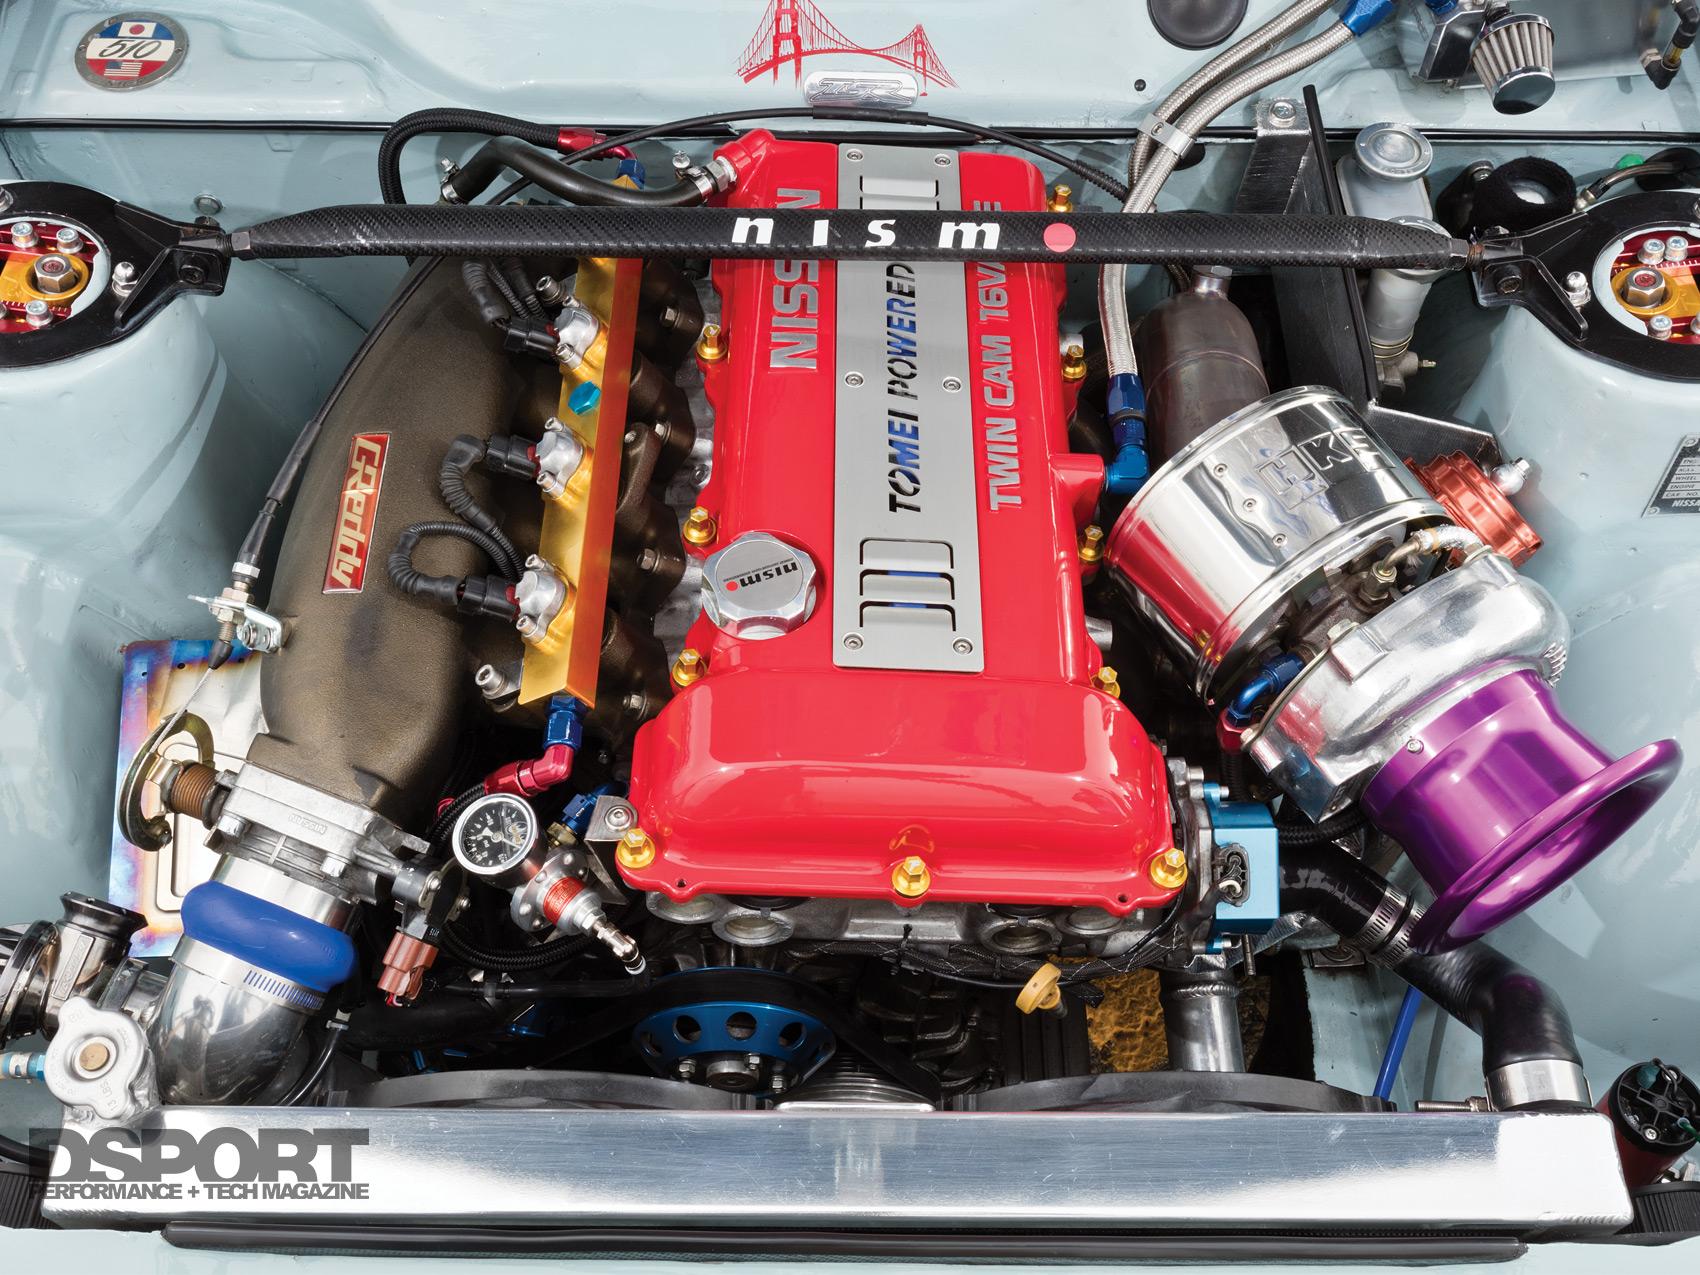 159-002-Feat-Paredes510-EngineBay